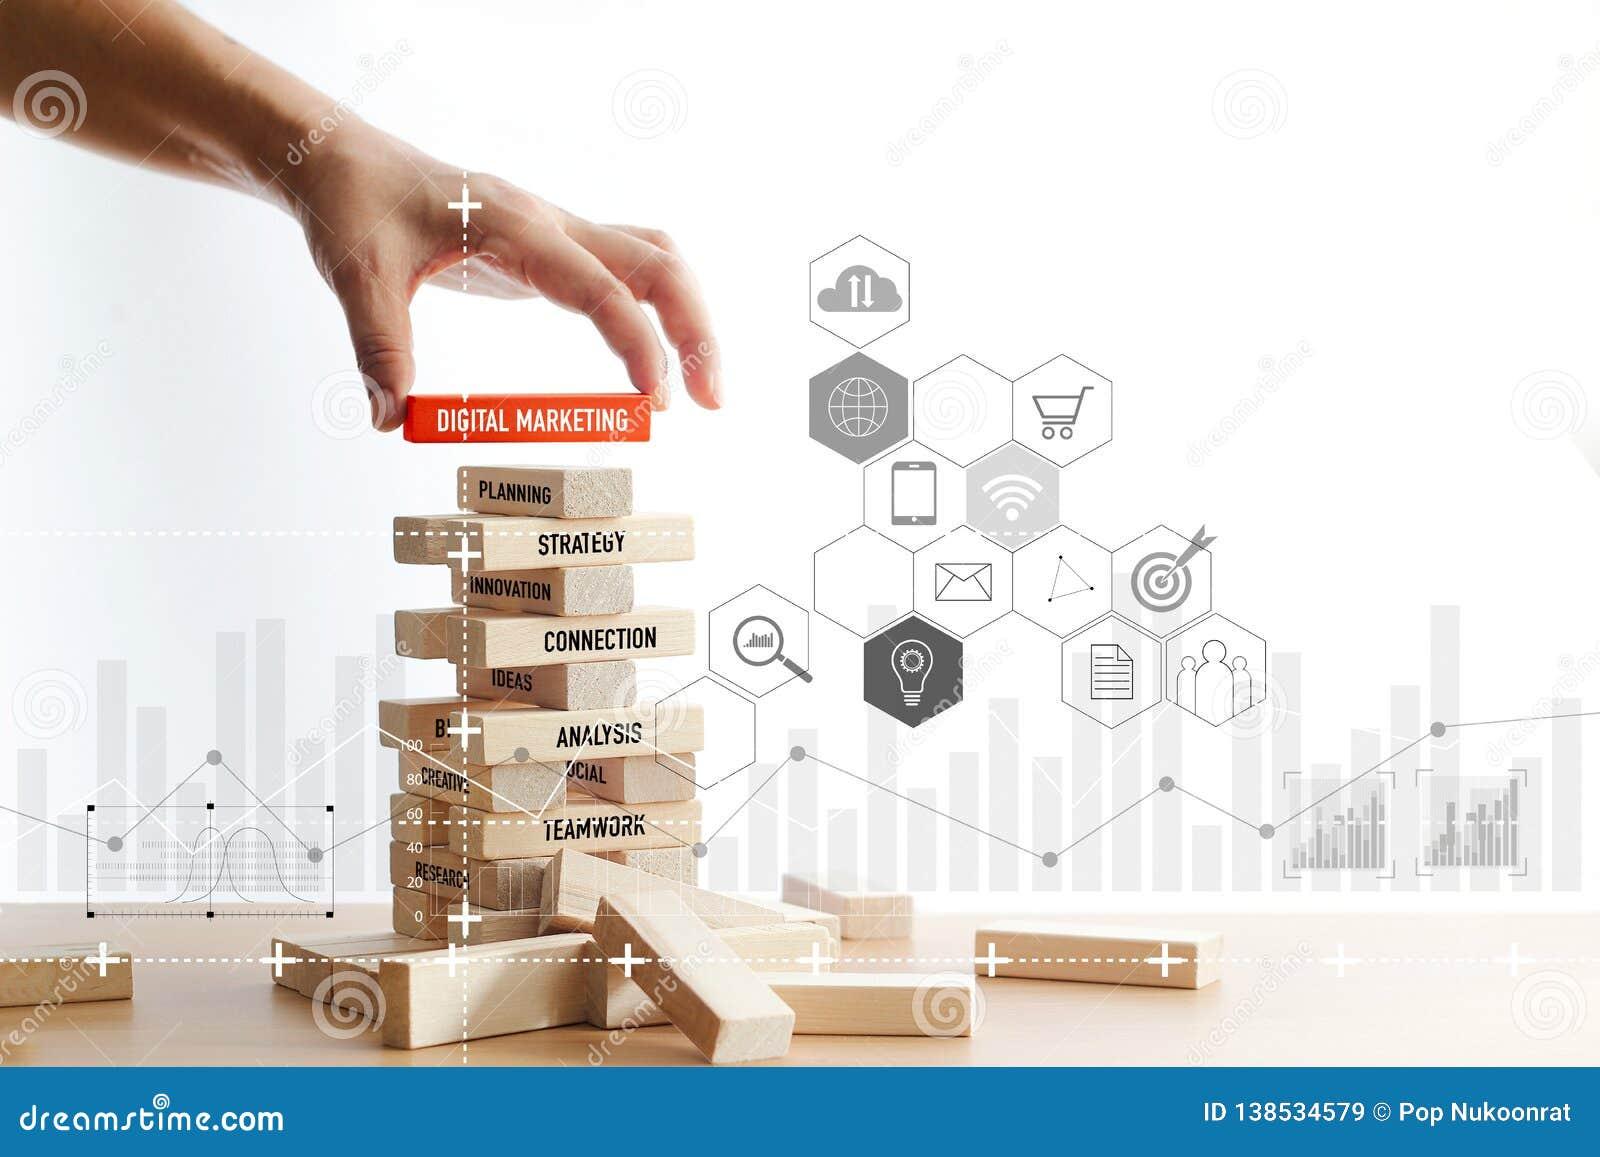 Digitaal marketing concept Hand die houten blok met digitaal marketing woord houden